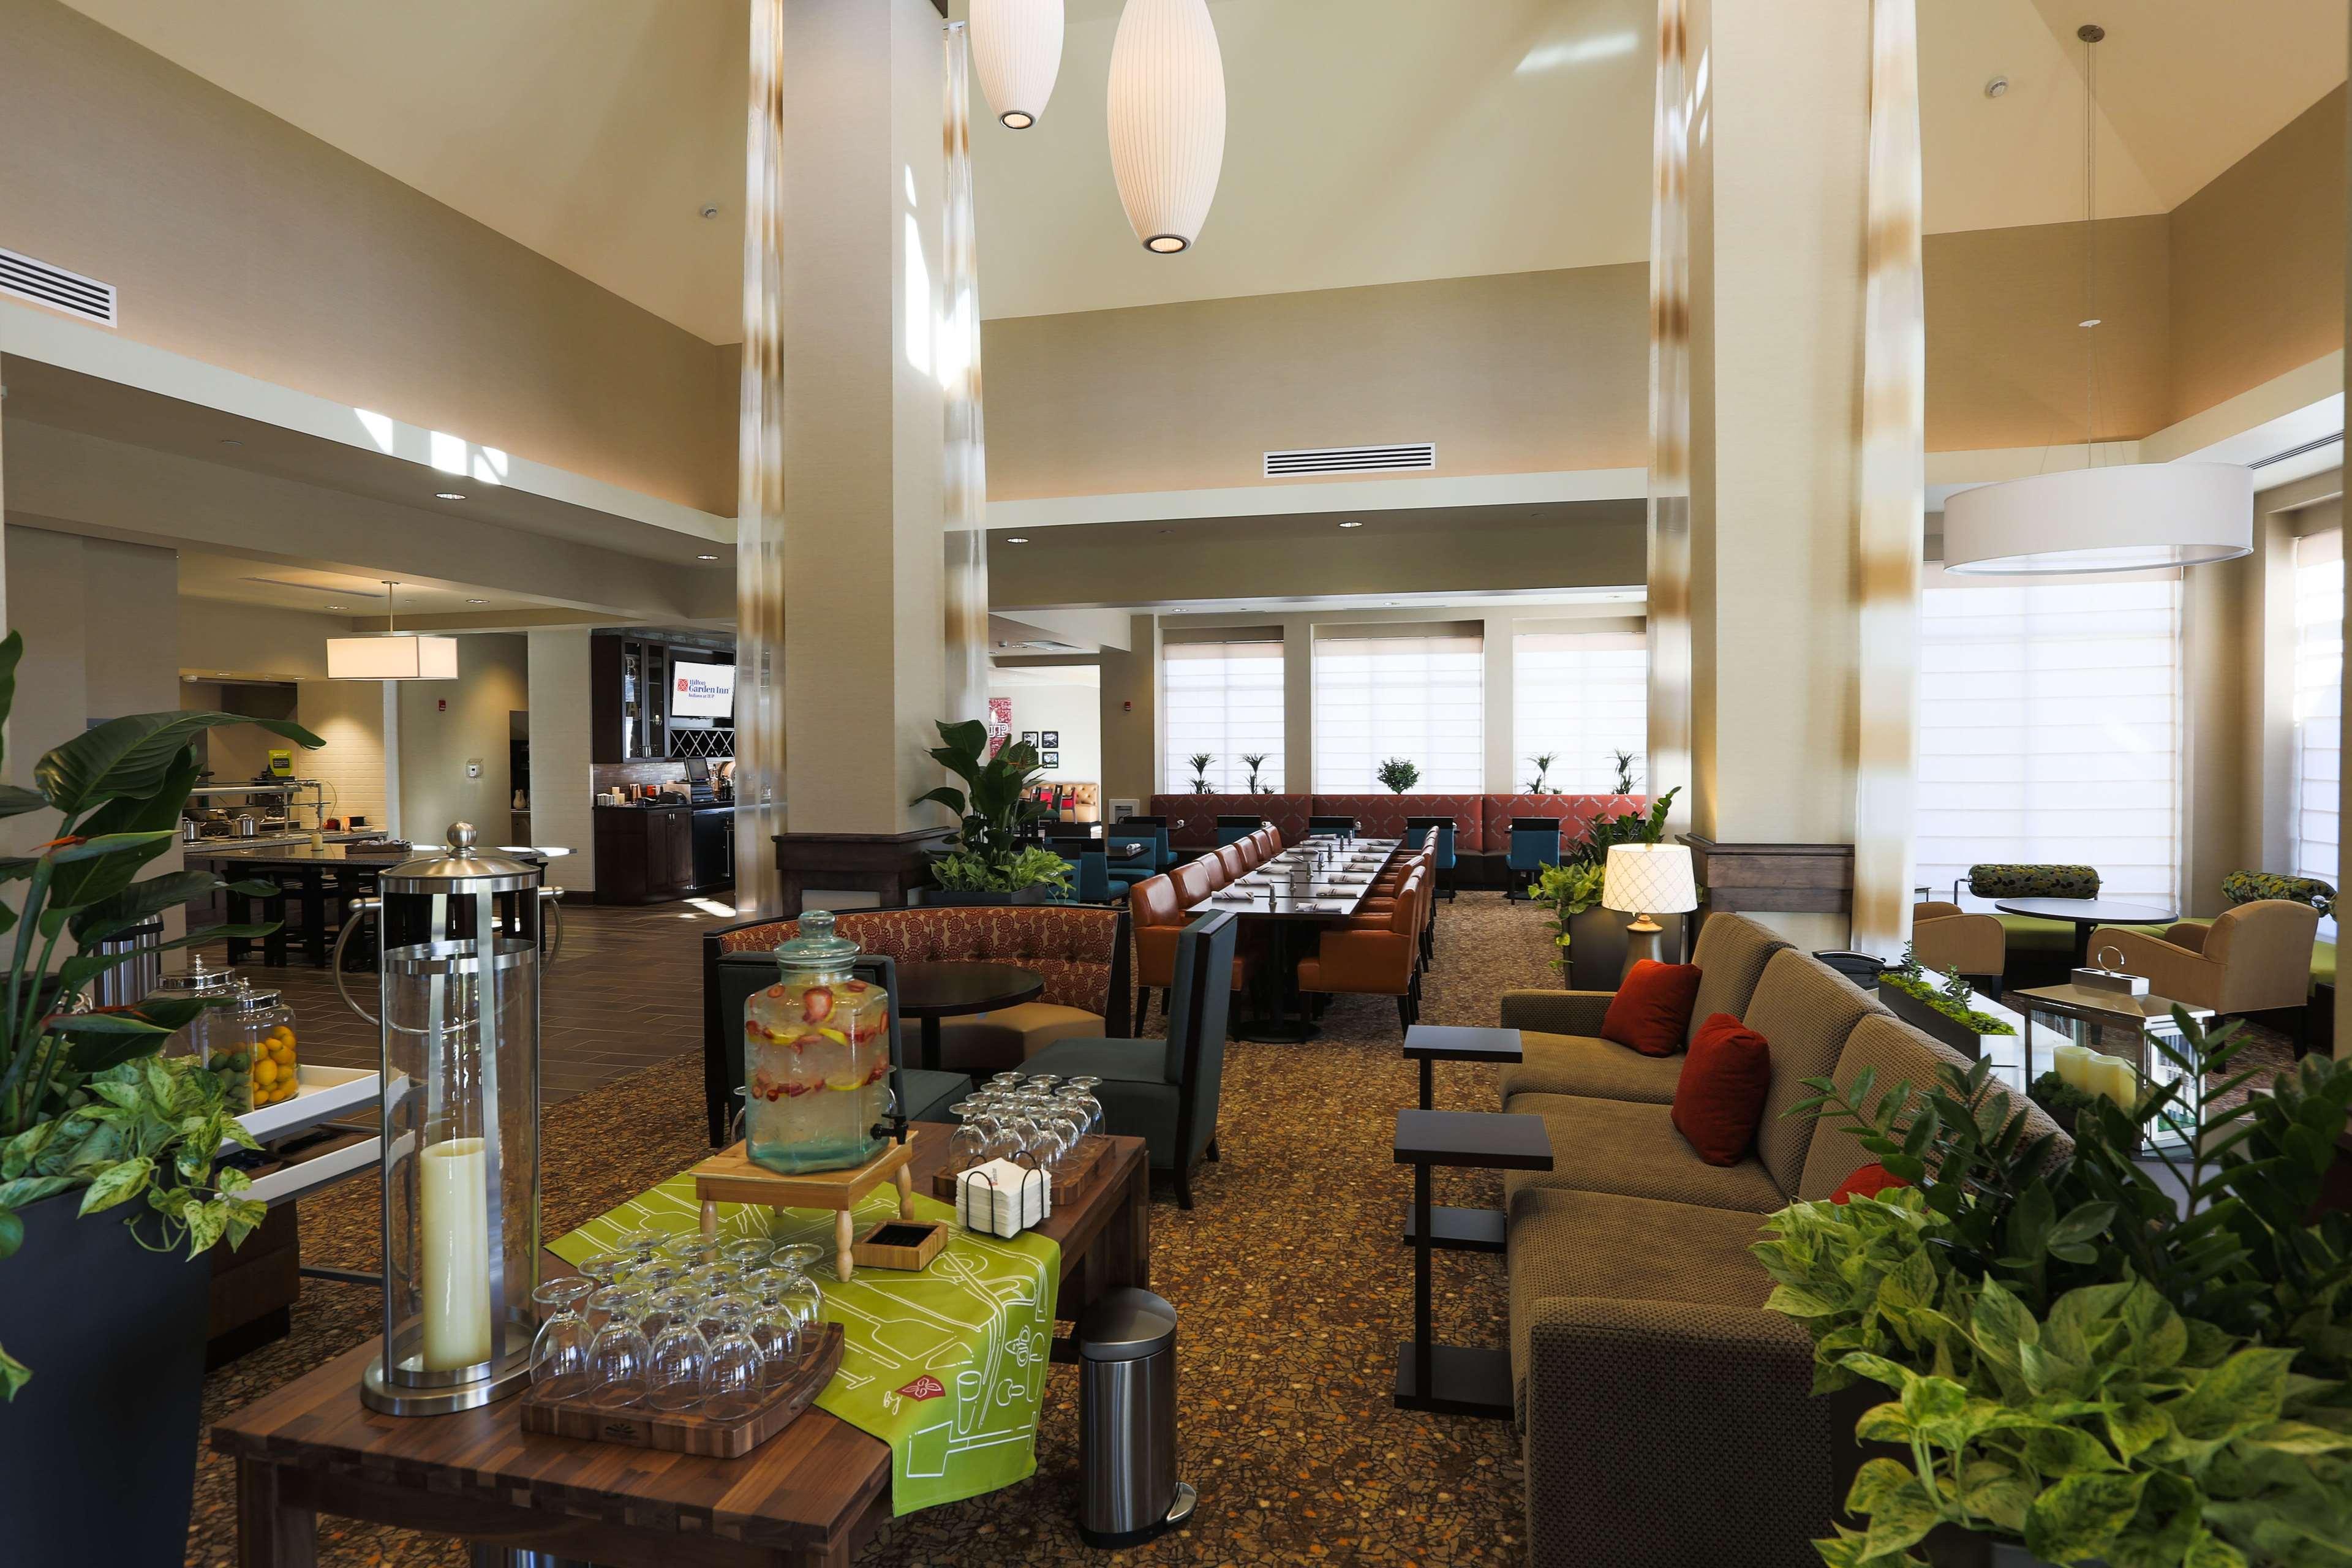 Hilton Garden Inn Indiana at IUP image 4